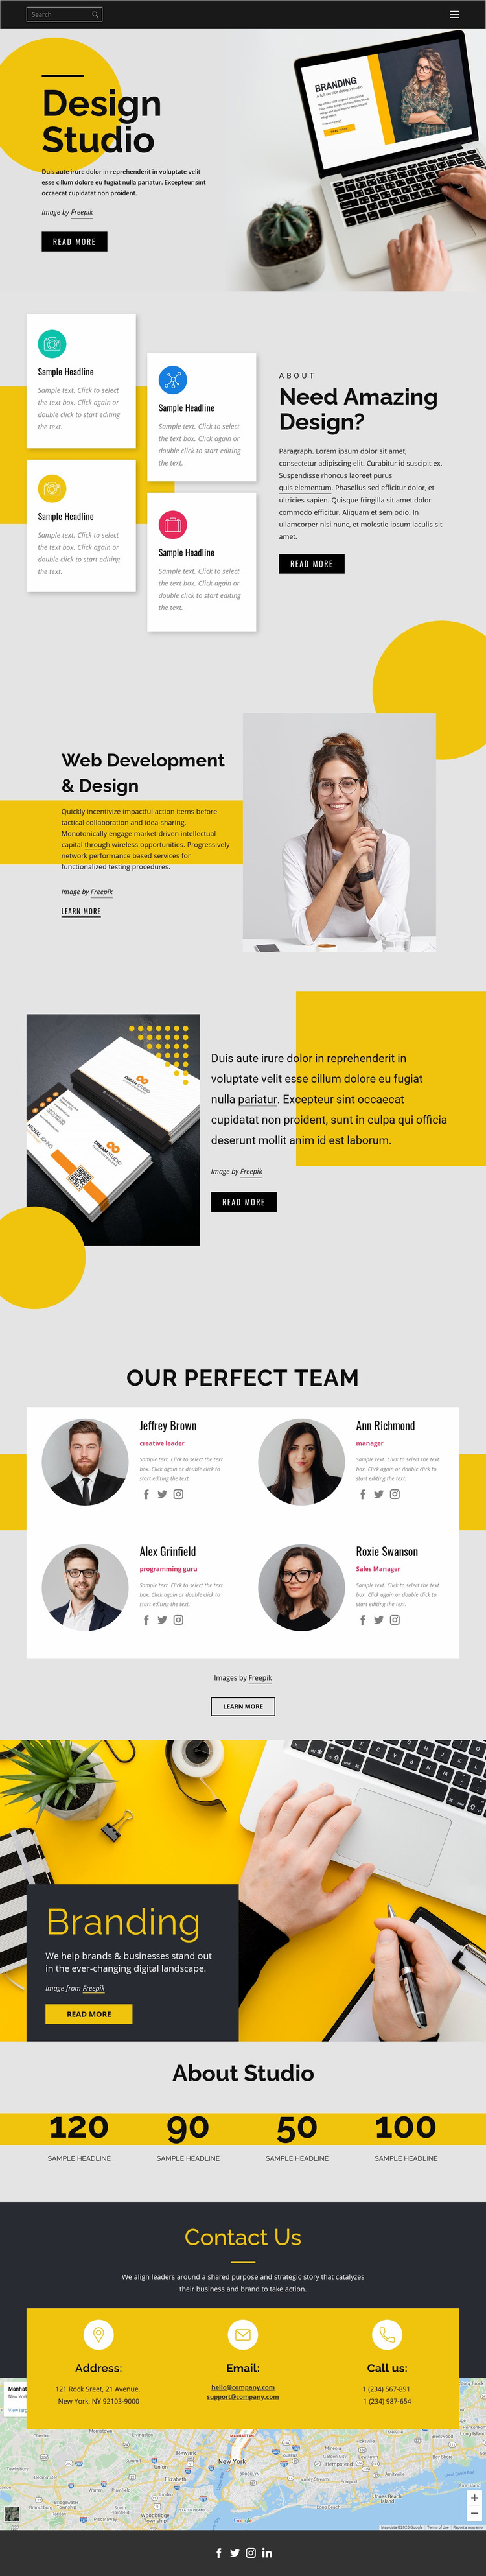 Brand, print & web design Web Page Design